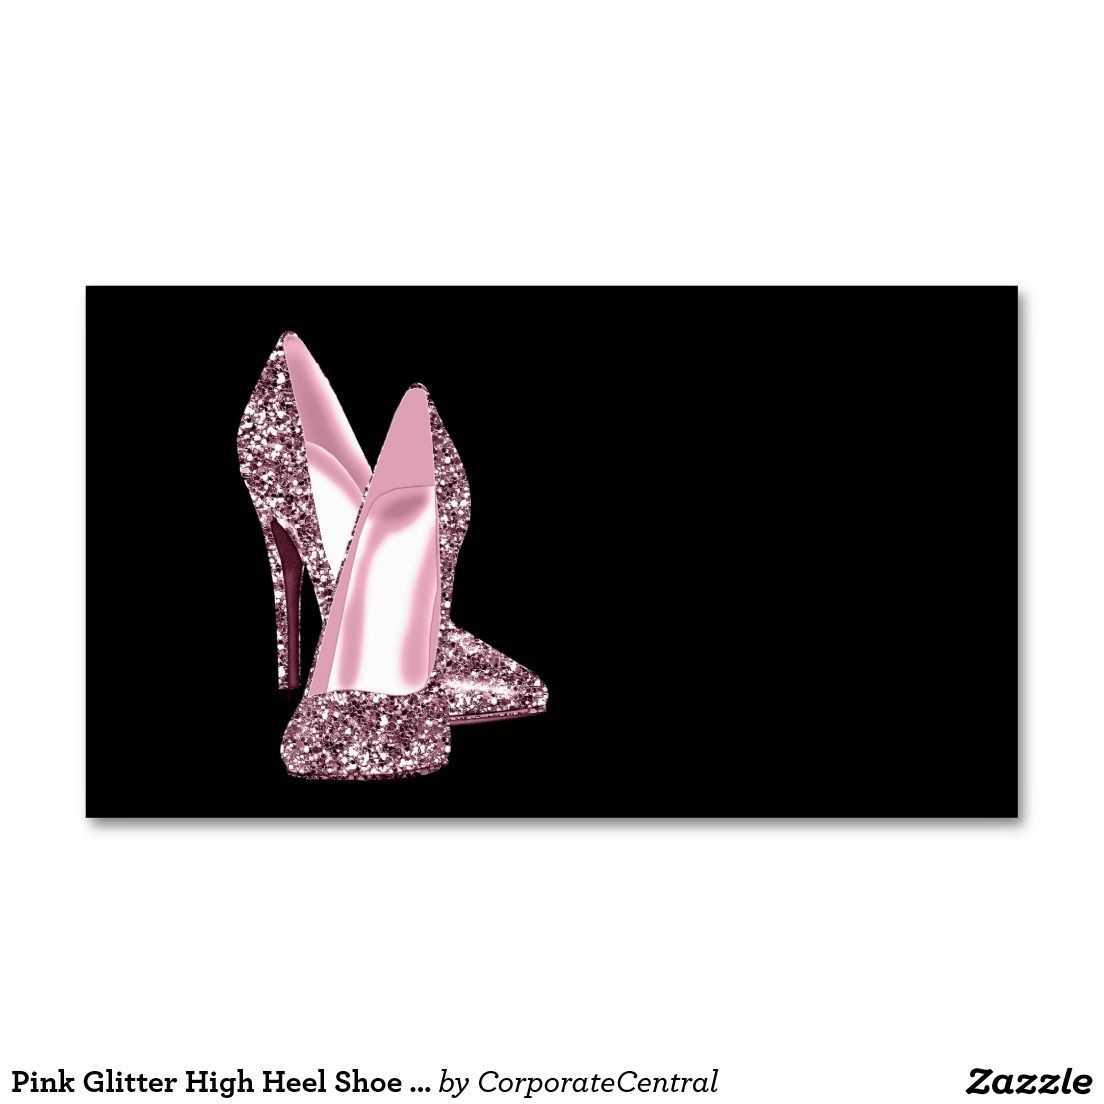 Pink Glitter High Heel Shoe Business Card Template   Zazzle Regarding High Heel Template For Cards